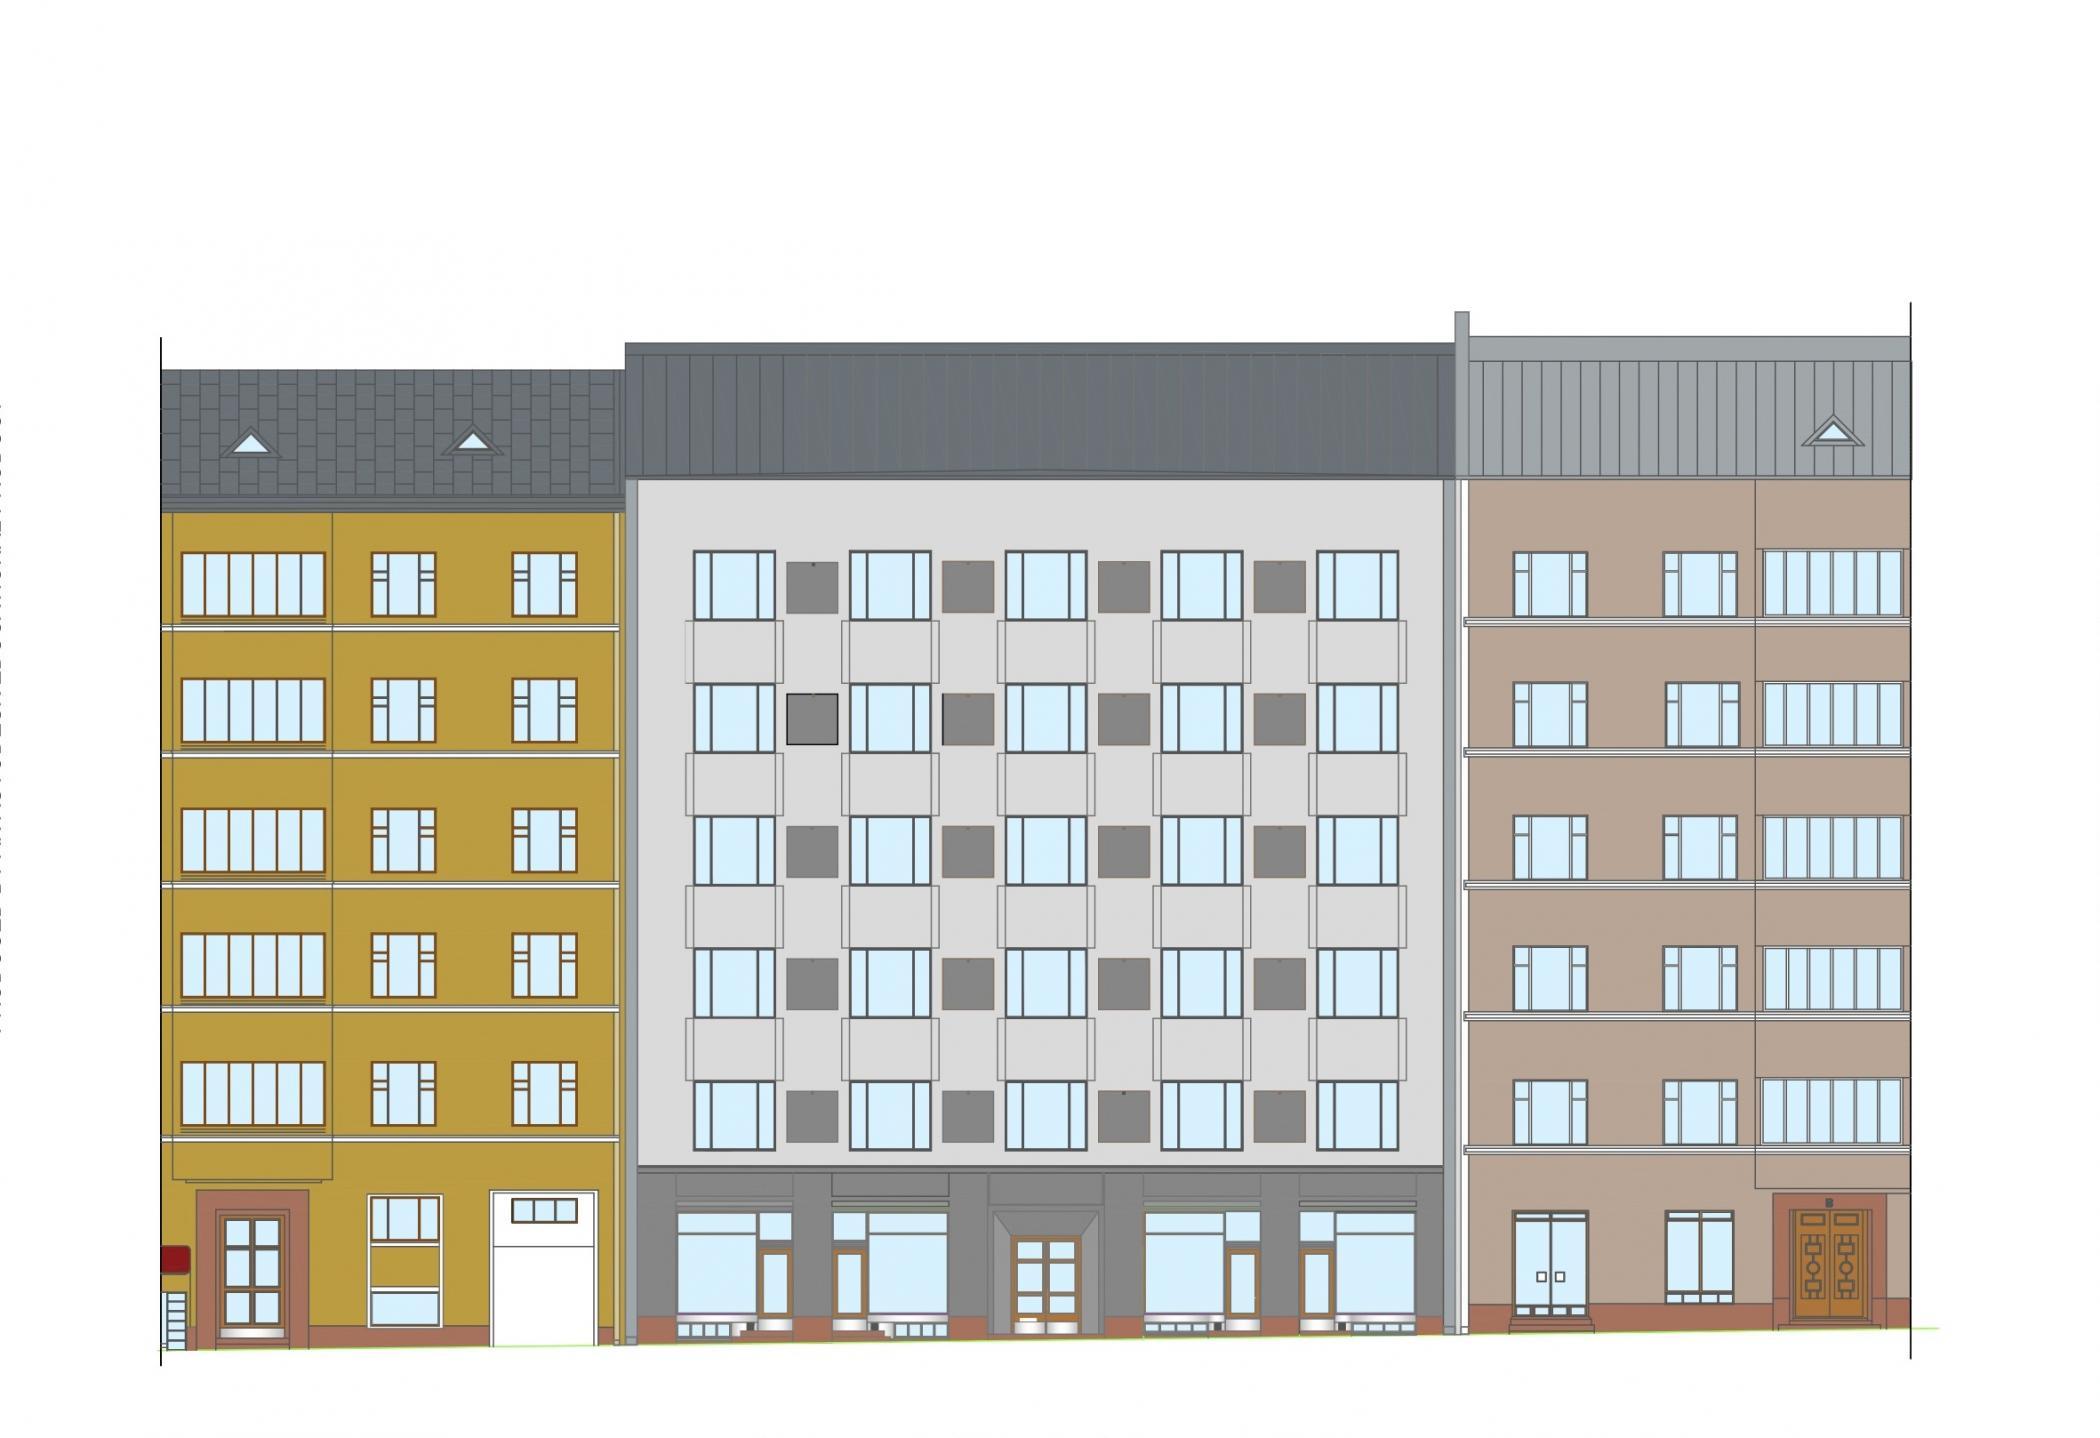 Skyscraper clipart apartment building Building Free Decor Apartment Cartoon